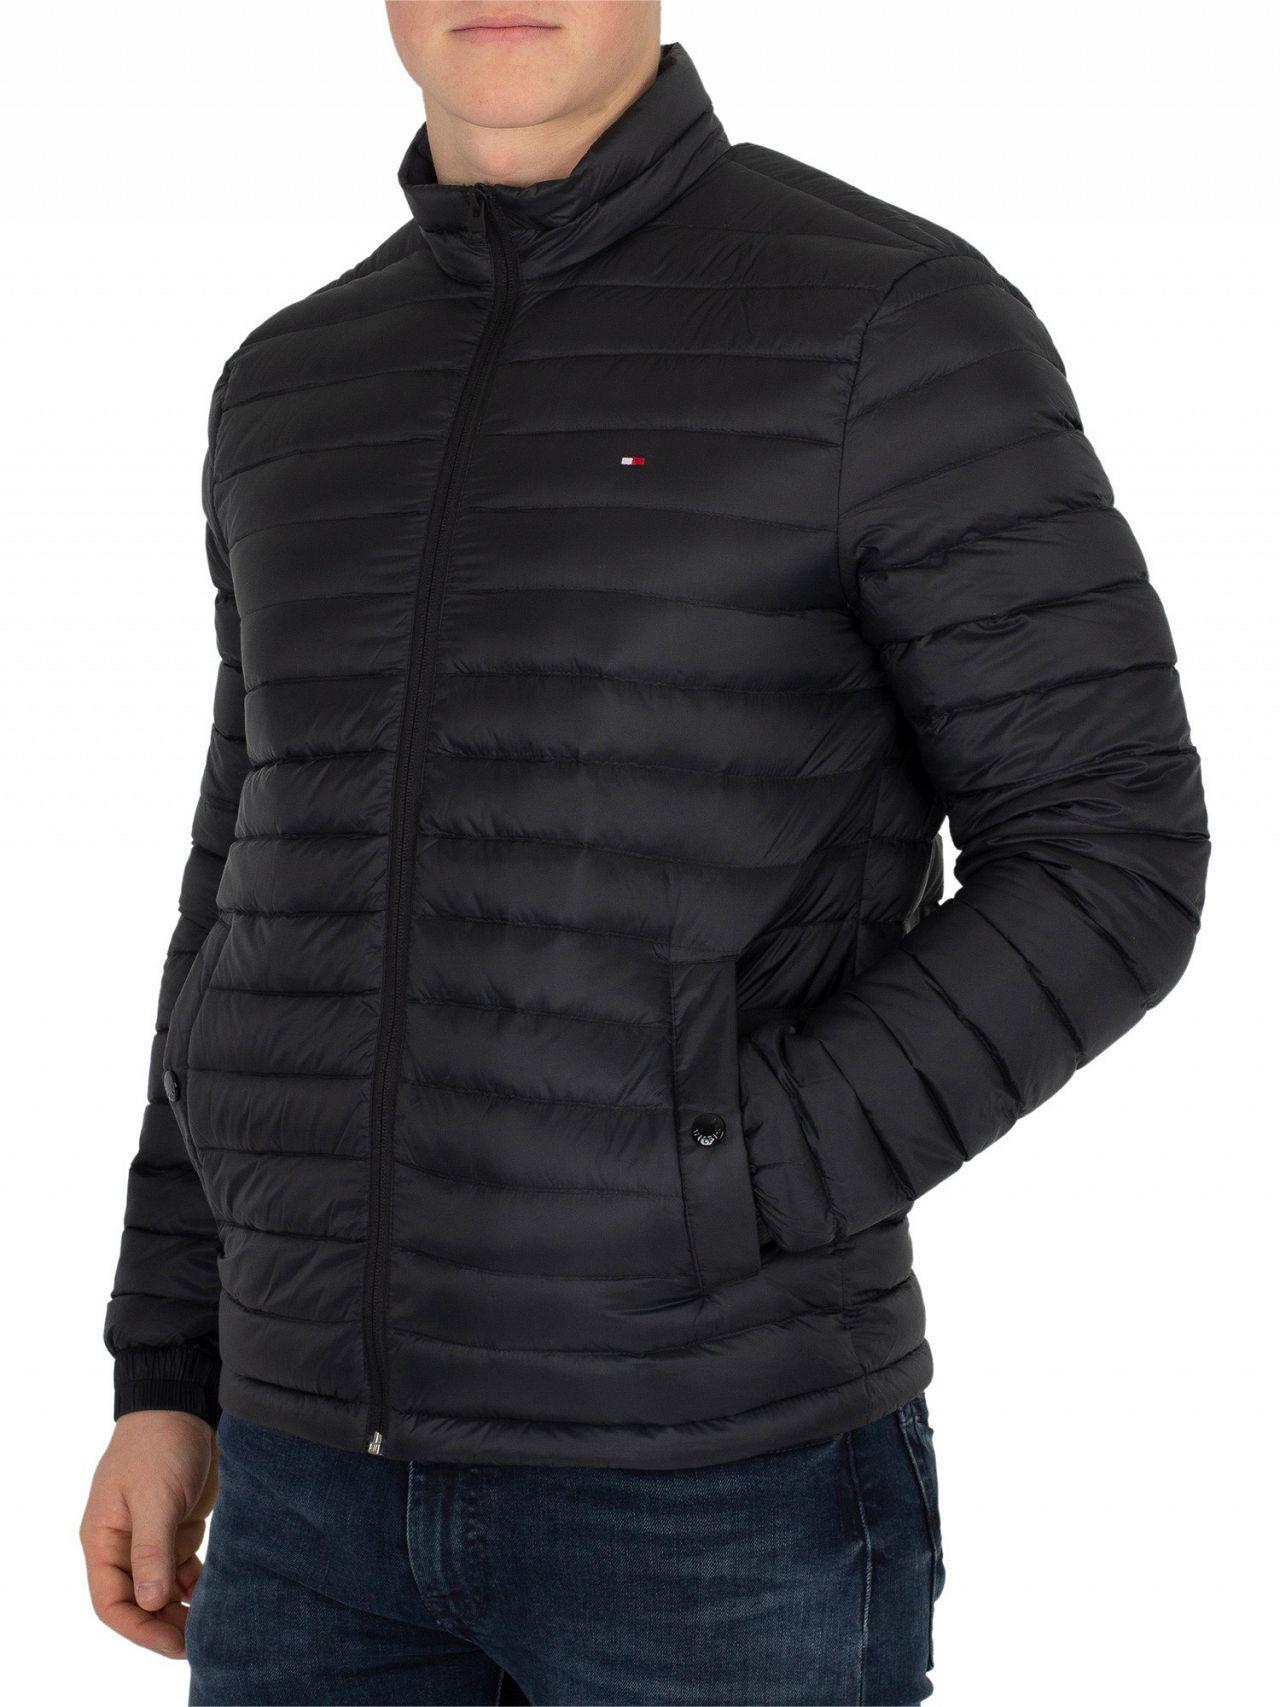 d18751e50294 Lyst - Tommy Hilfiger Jet Black Core Lightweight Packable Down Jacket in  Black for Men